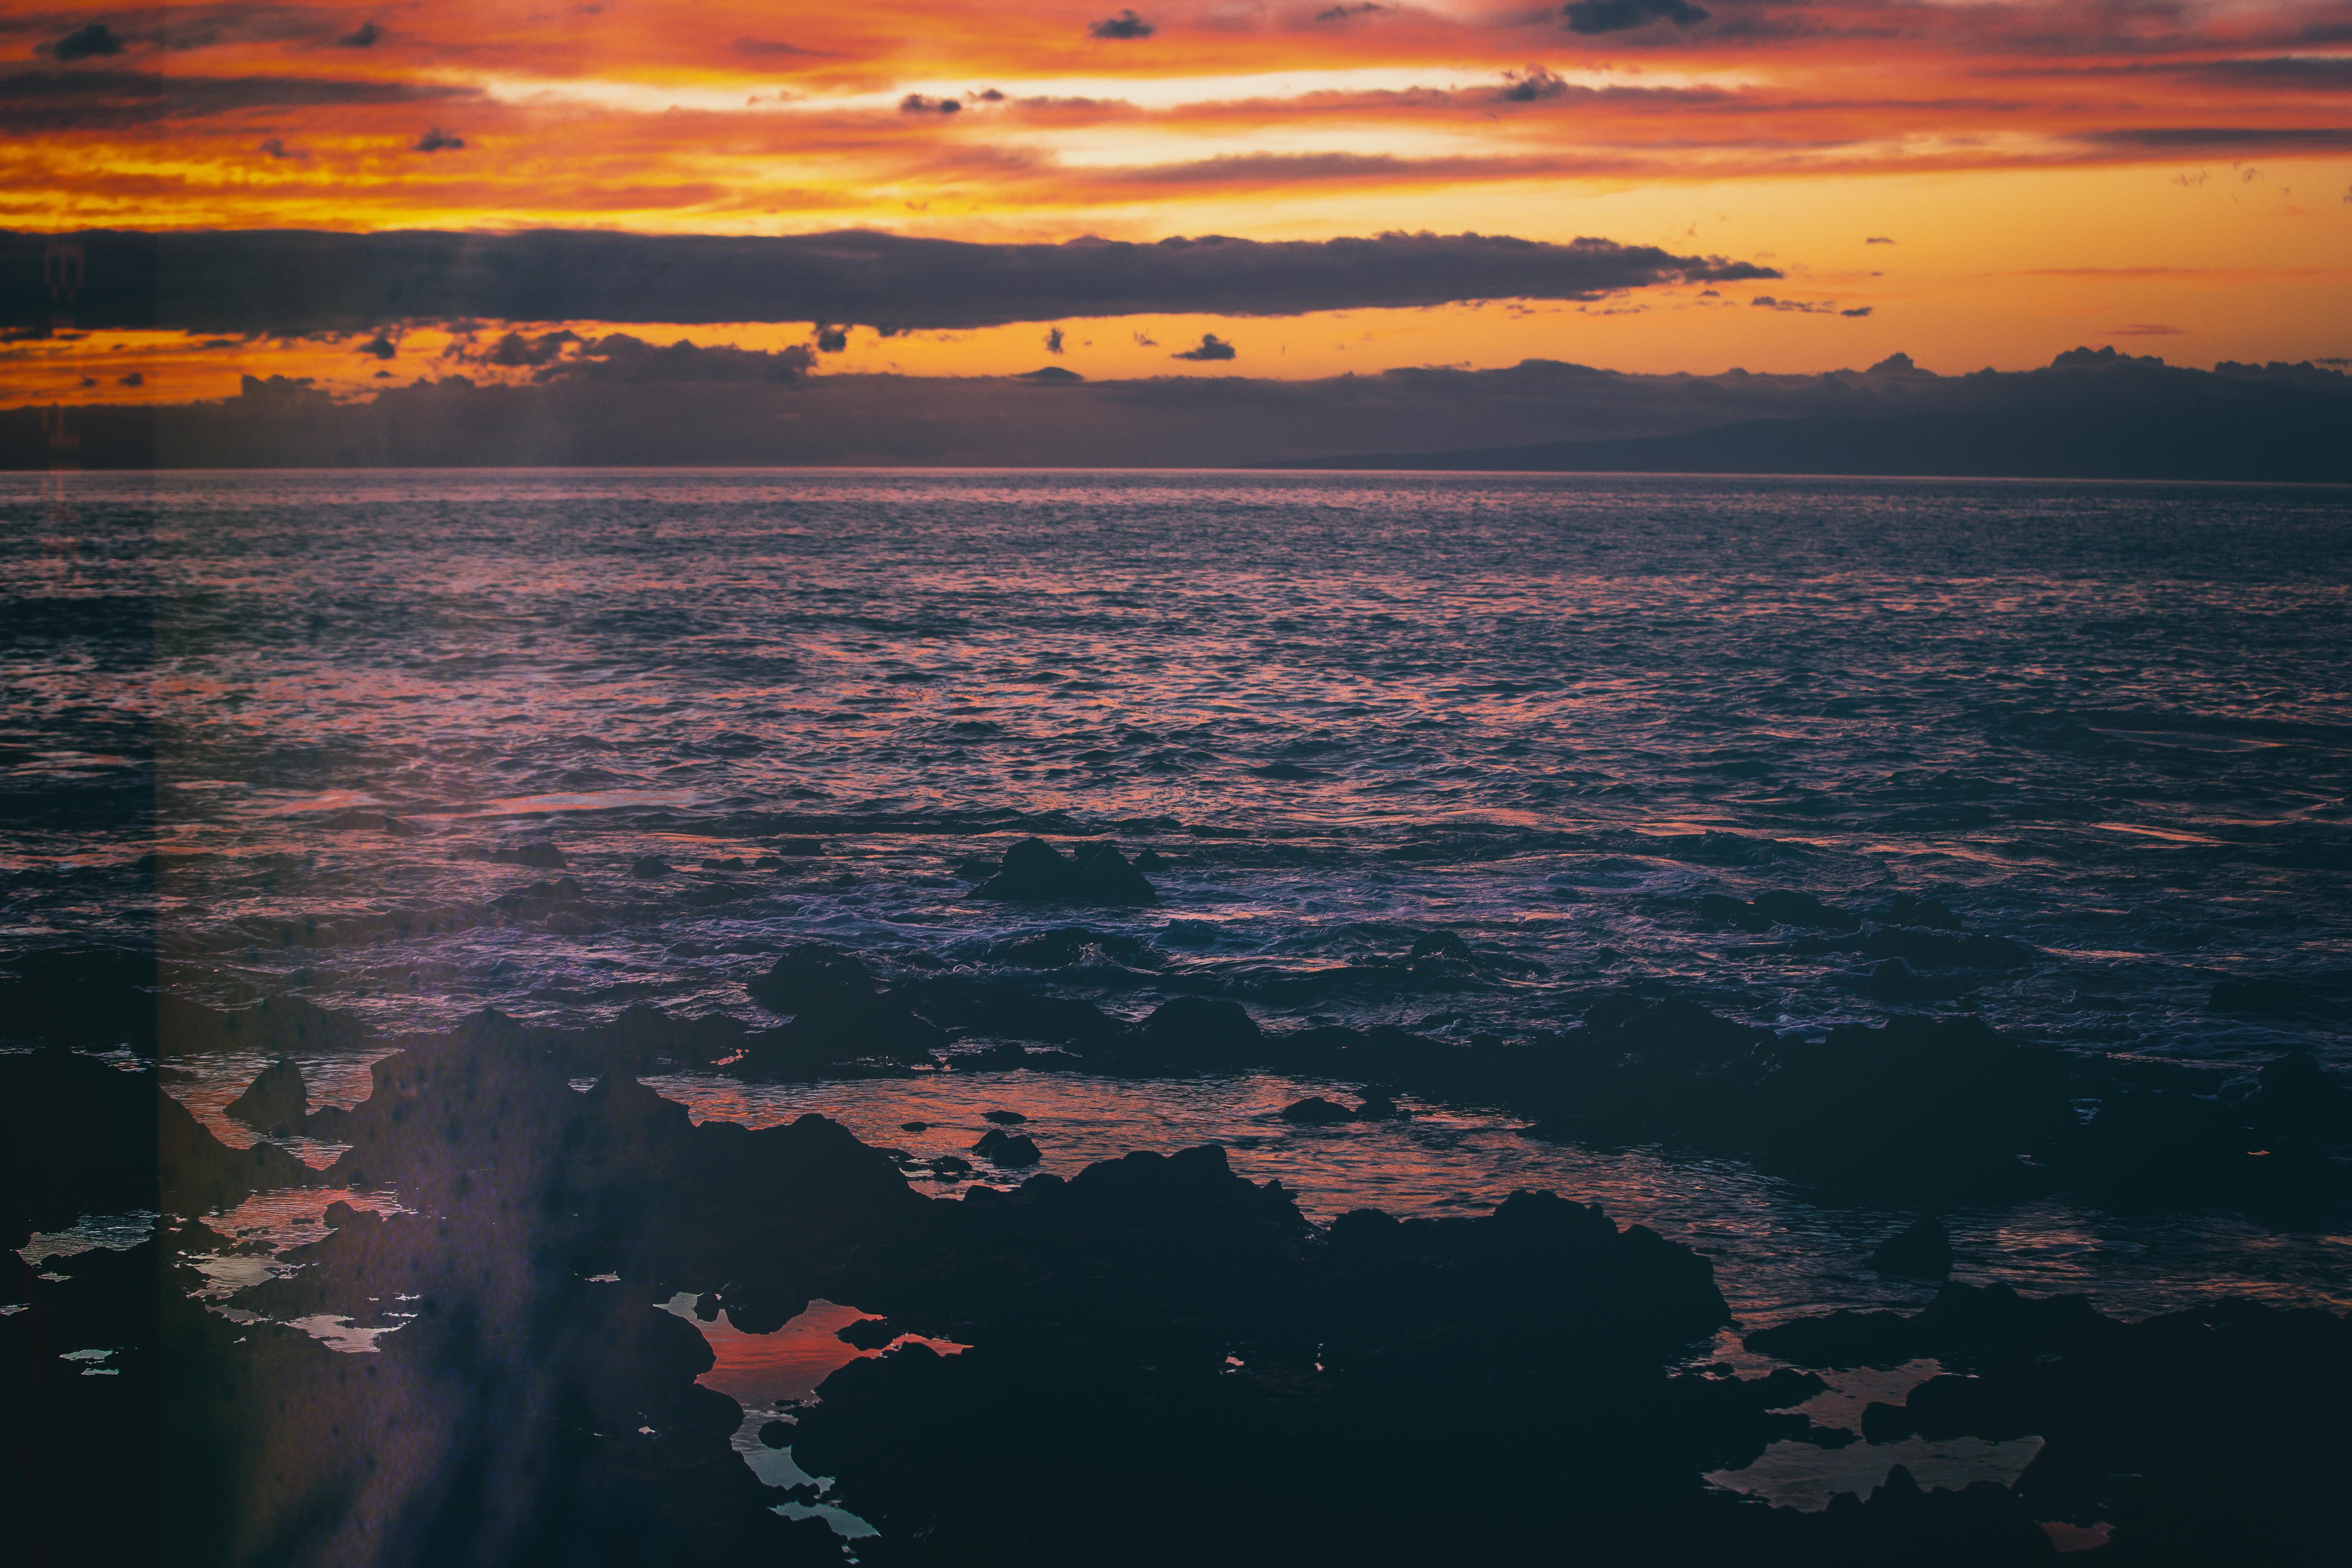 sunset sea evening 1574937786 - Sunset Sea Evening -